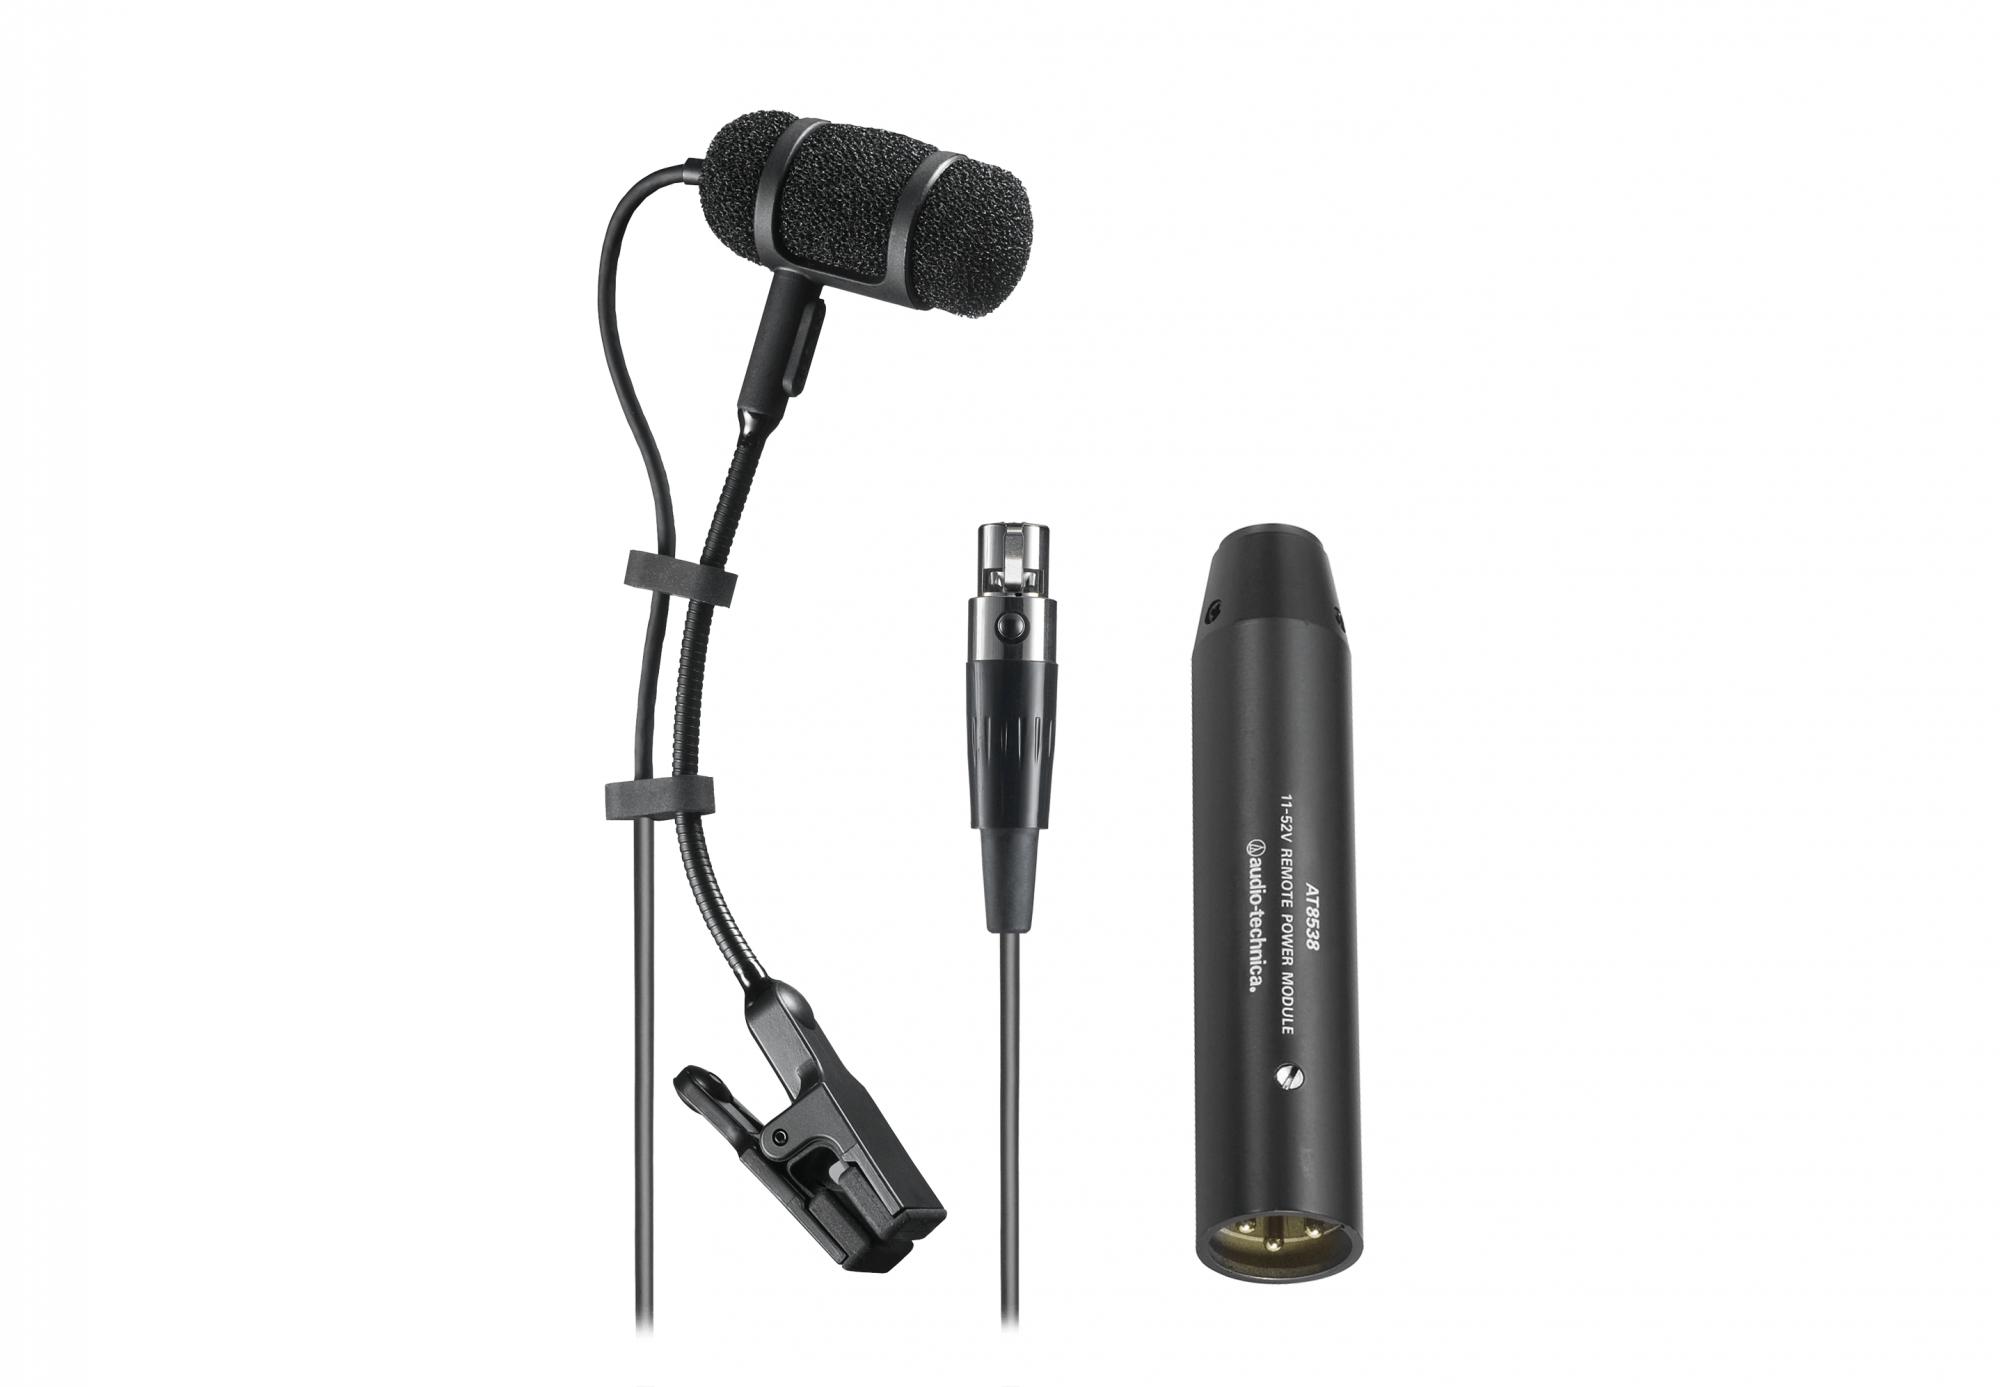 Audio Technica PRO35 Clip on Condenser Mic with XLR Adapter